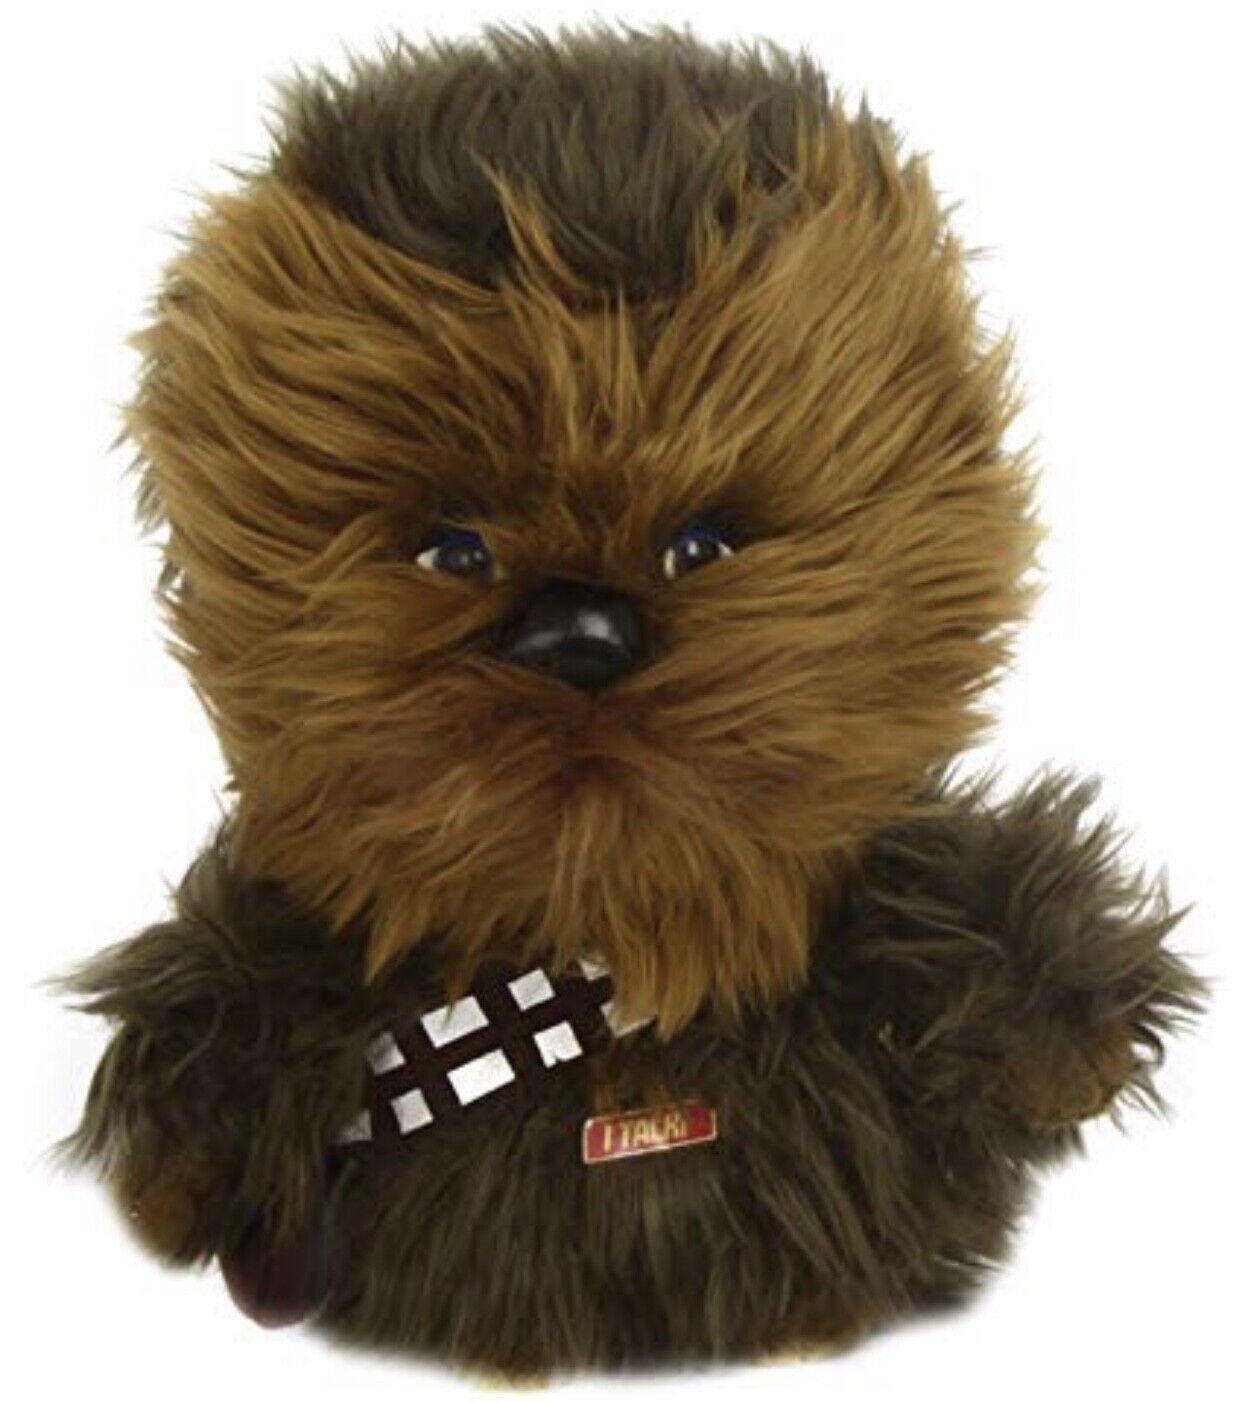 Star Wars Plush - Stuffed Talking Chewbacca Character Plush